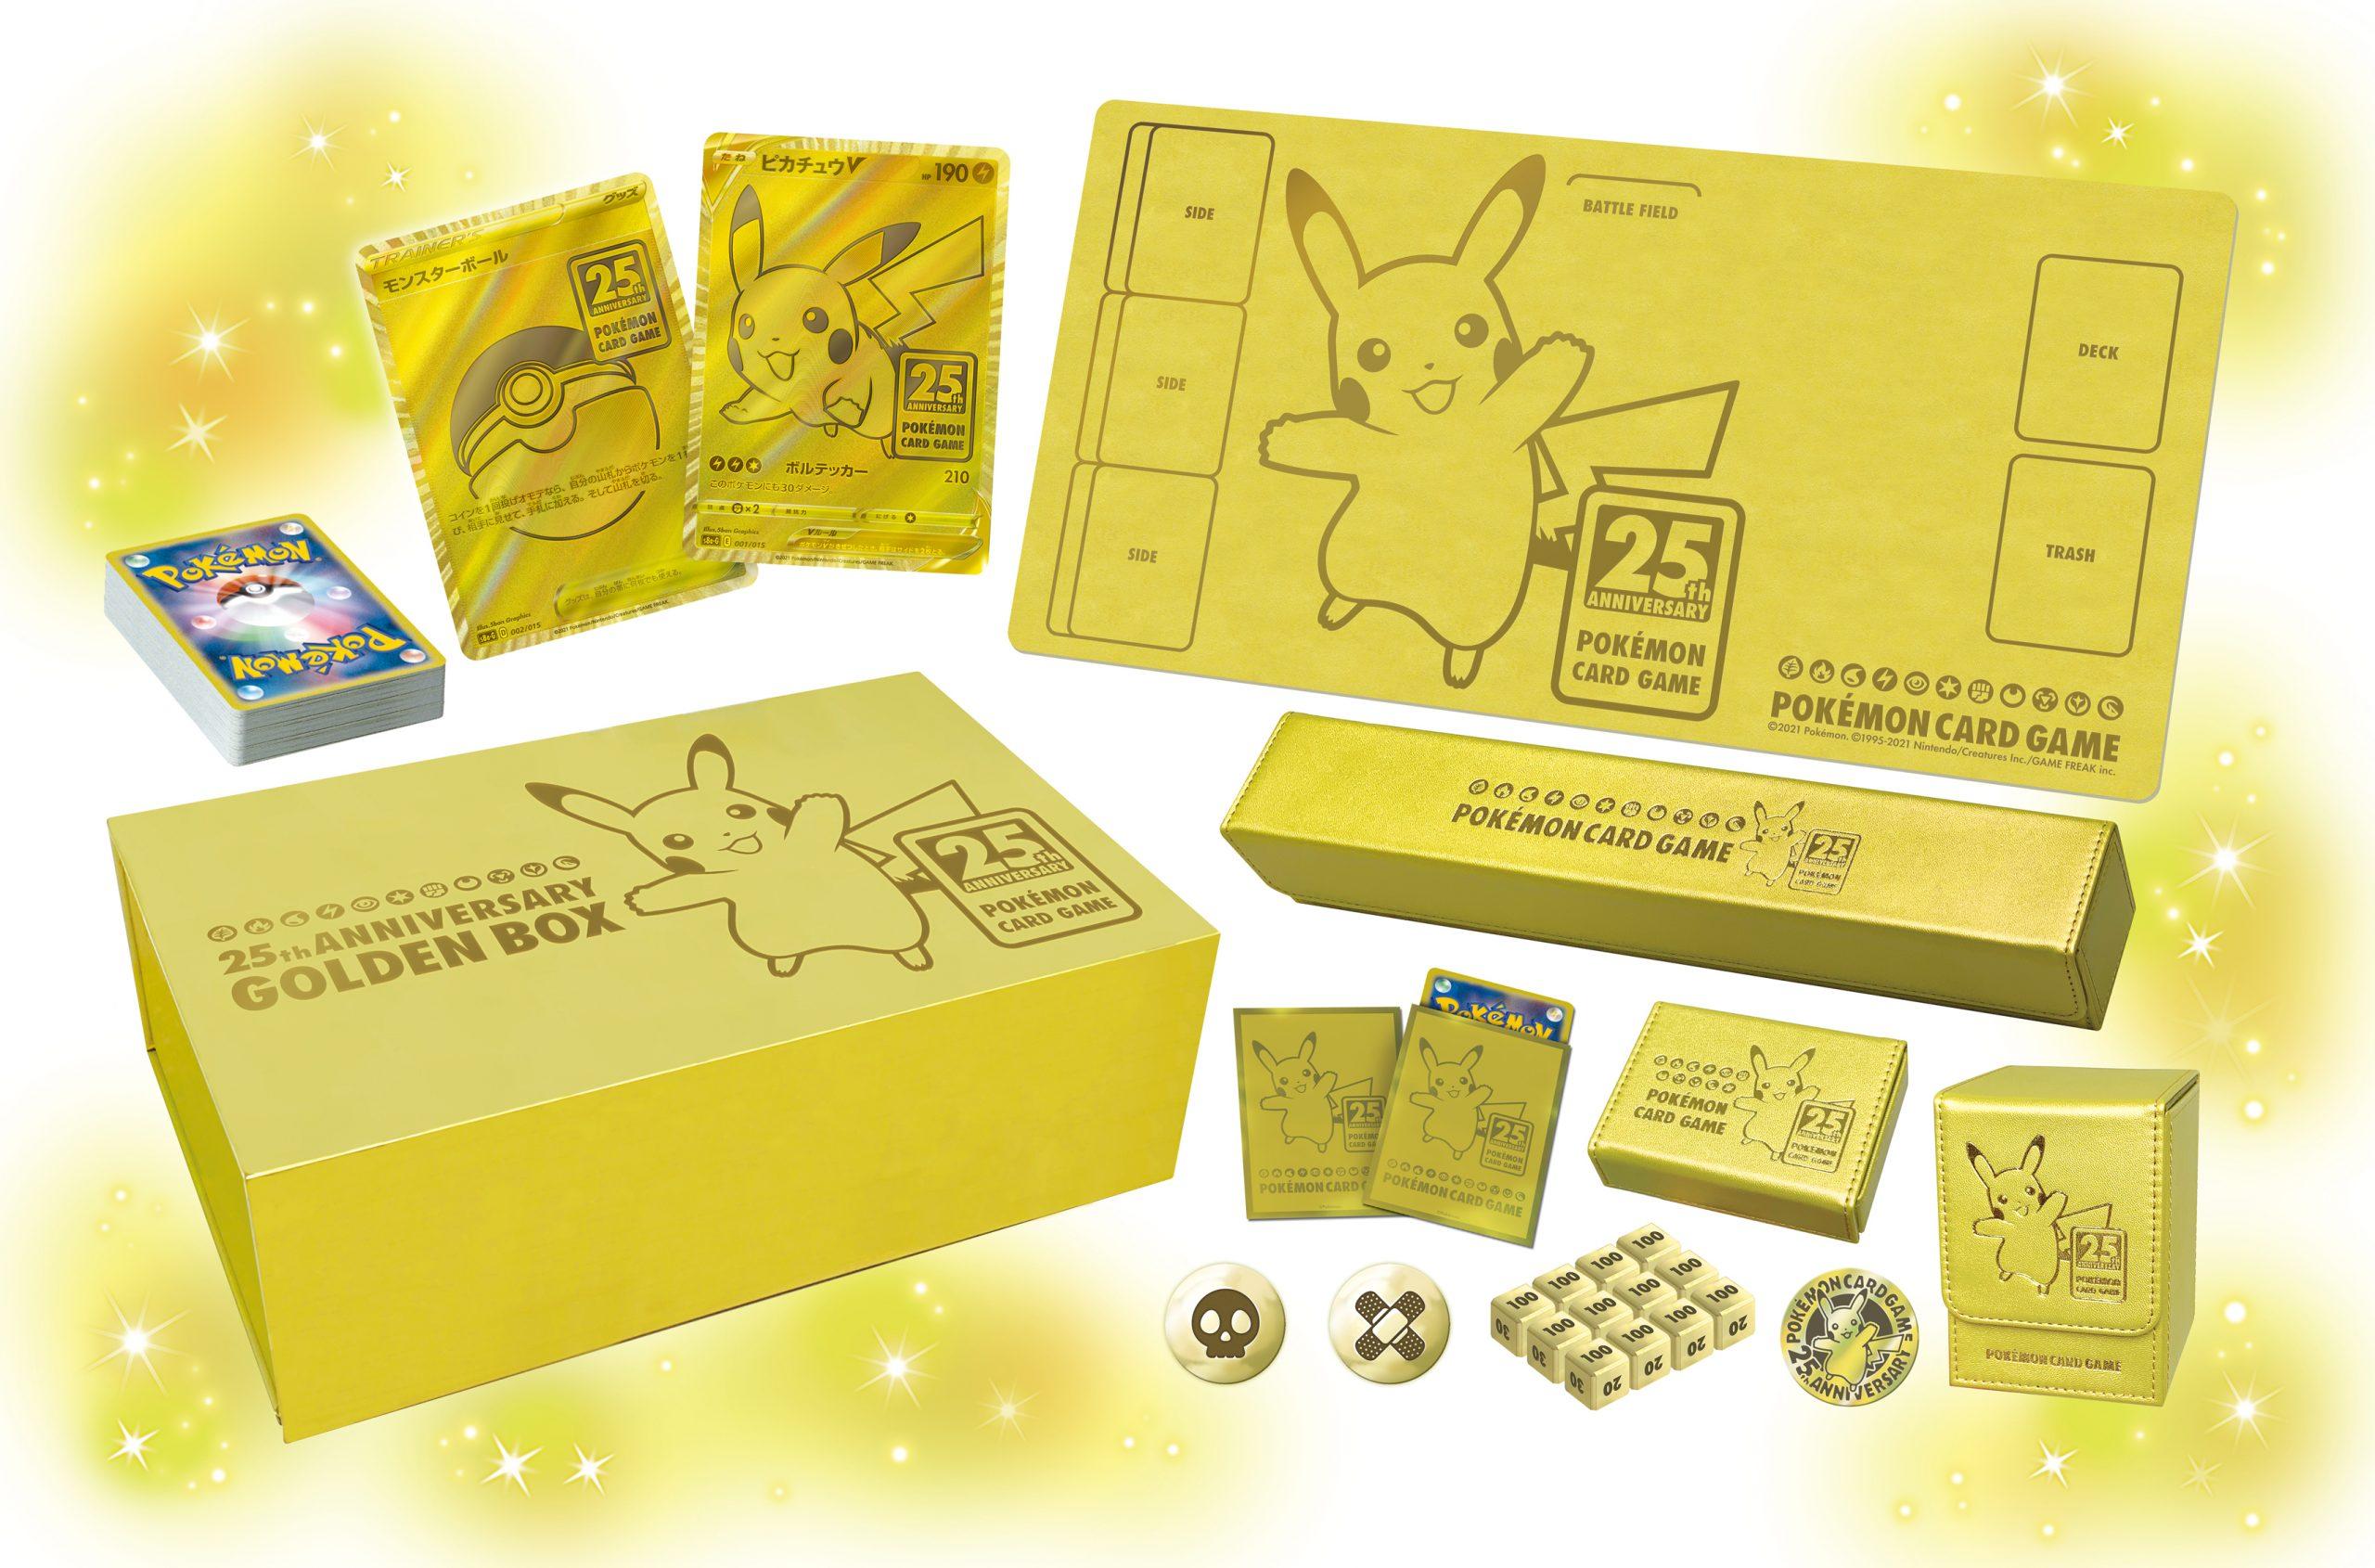 25th Anniversary Golden Box.jpg